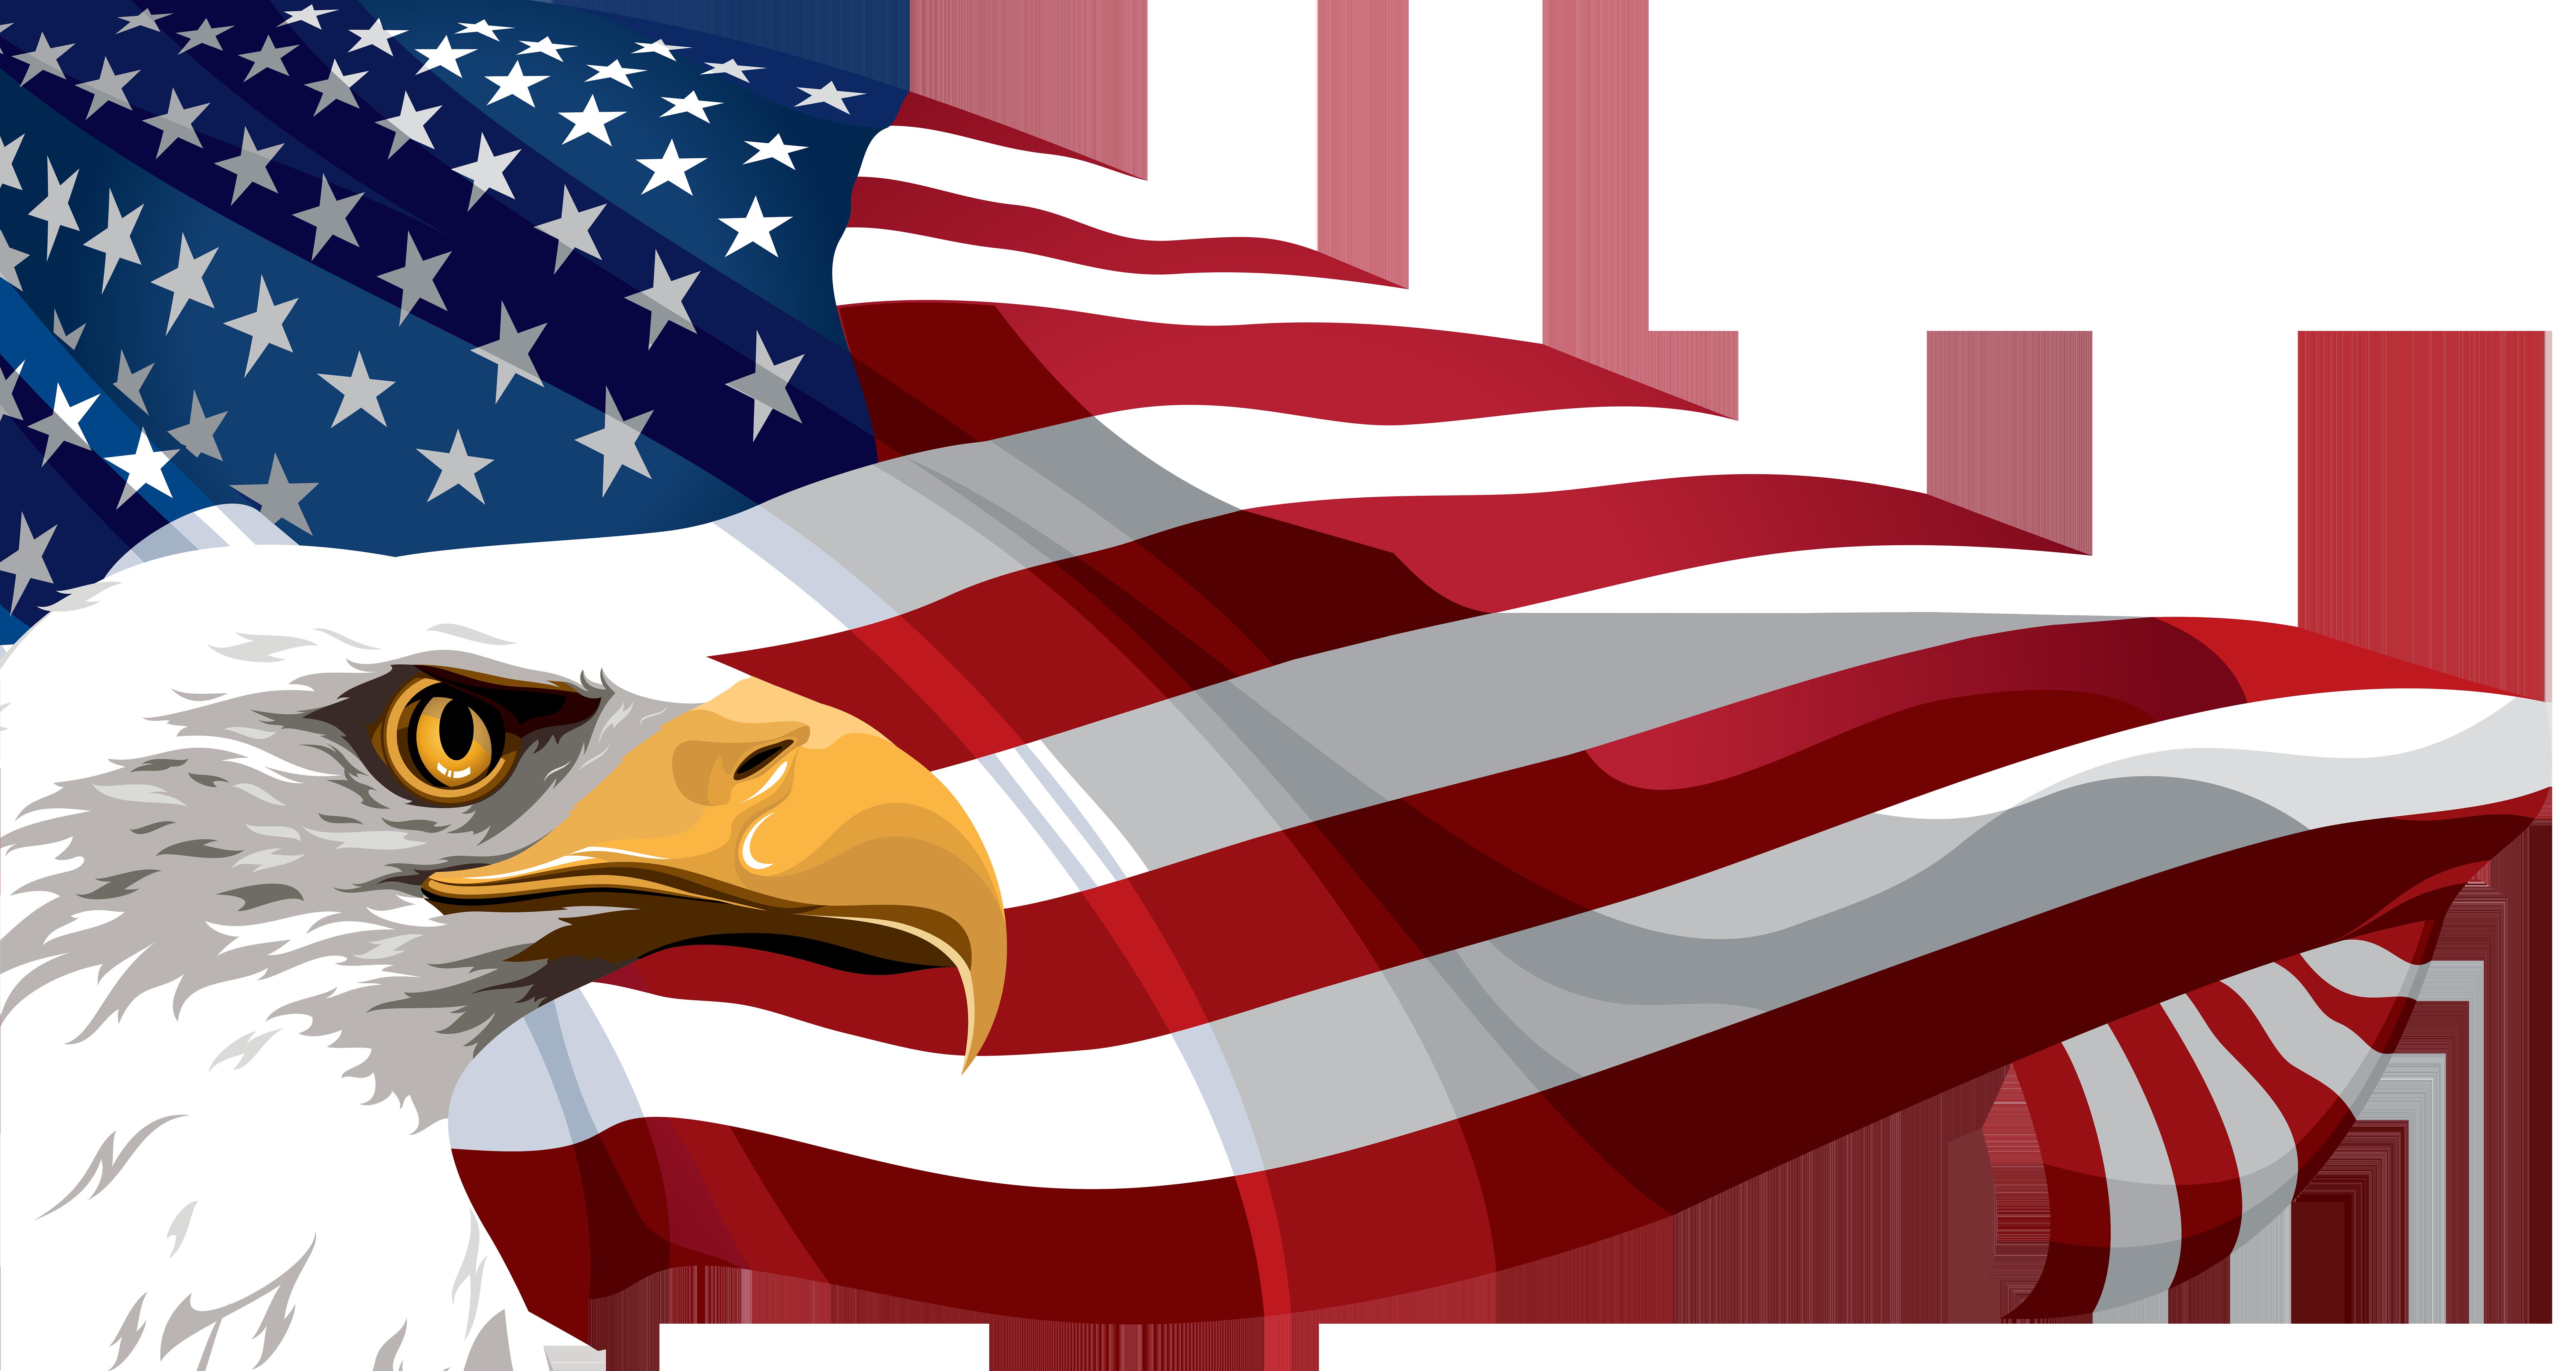 American flag and eagle.